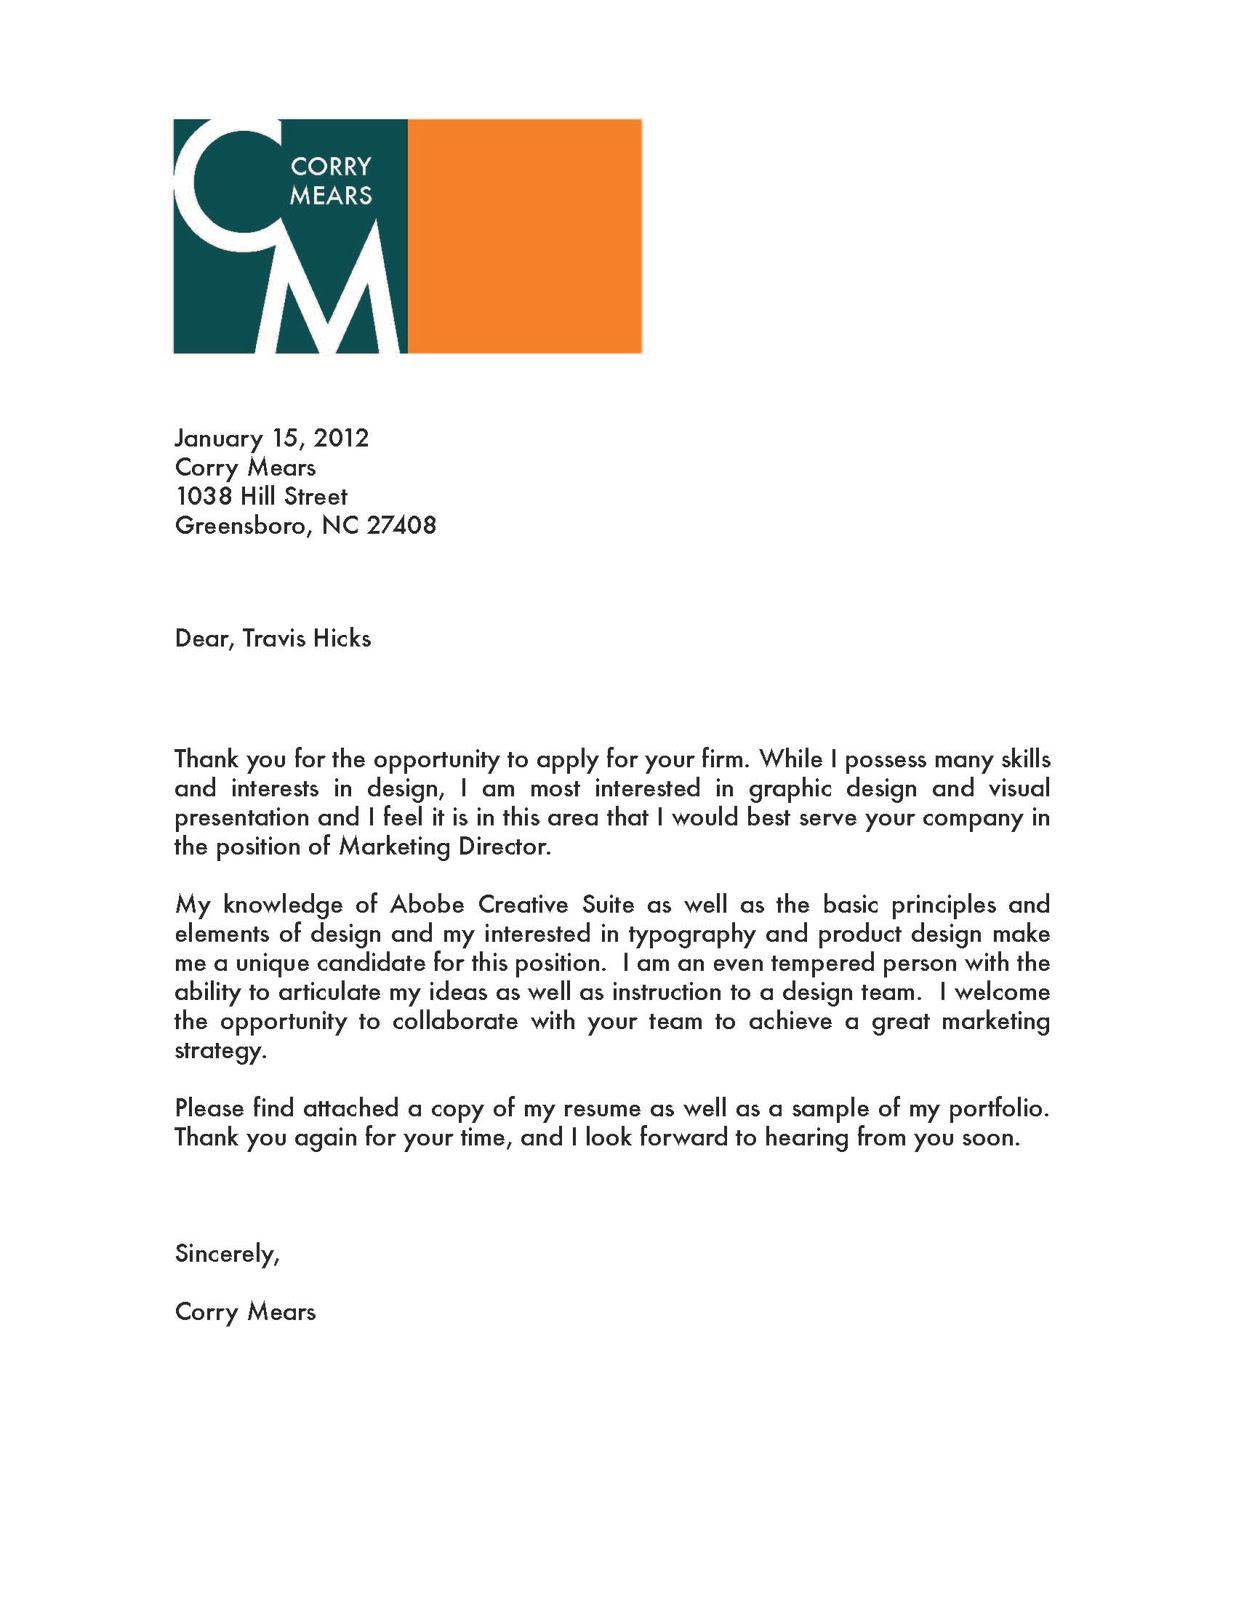 Cover Letter For Web Design Proposal June 2021